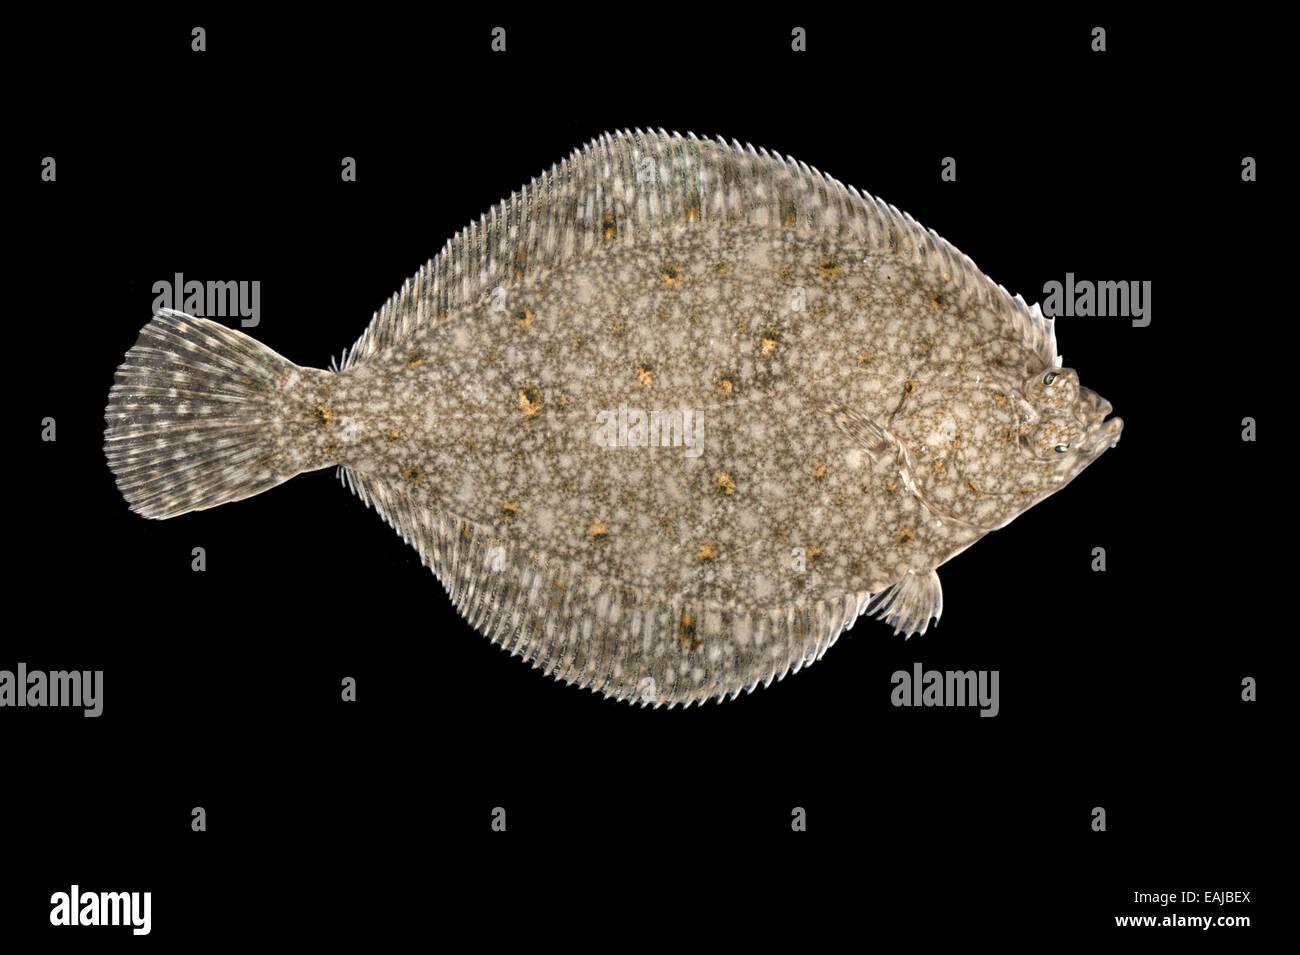 Plaice - Pleuronectes platessa - Stock Image